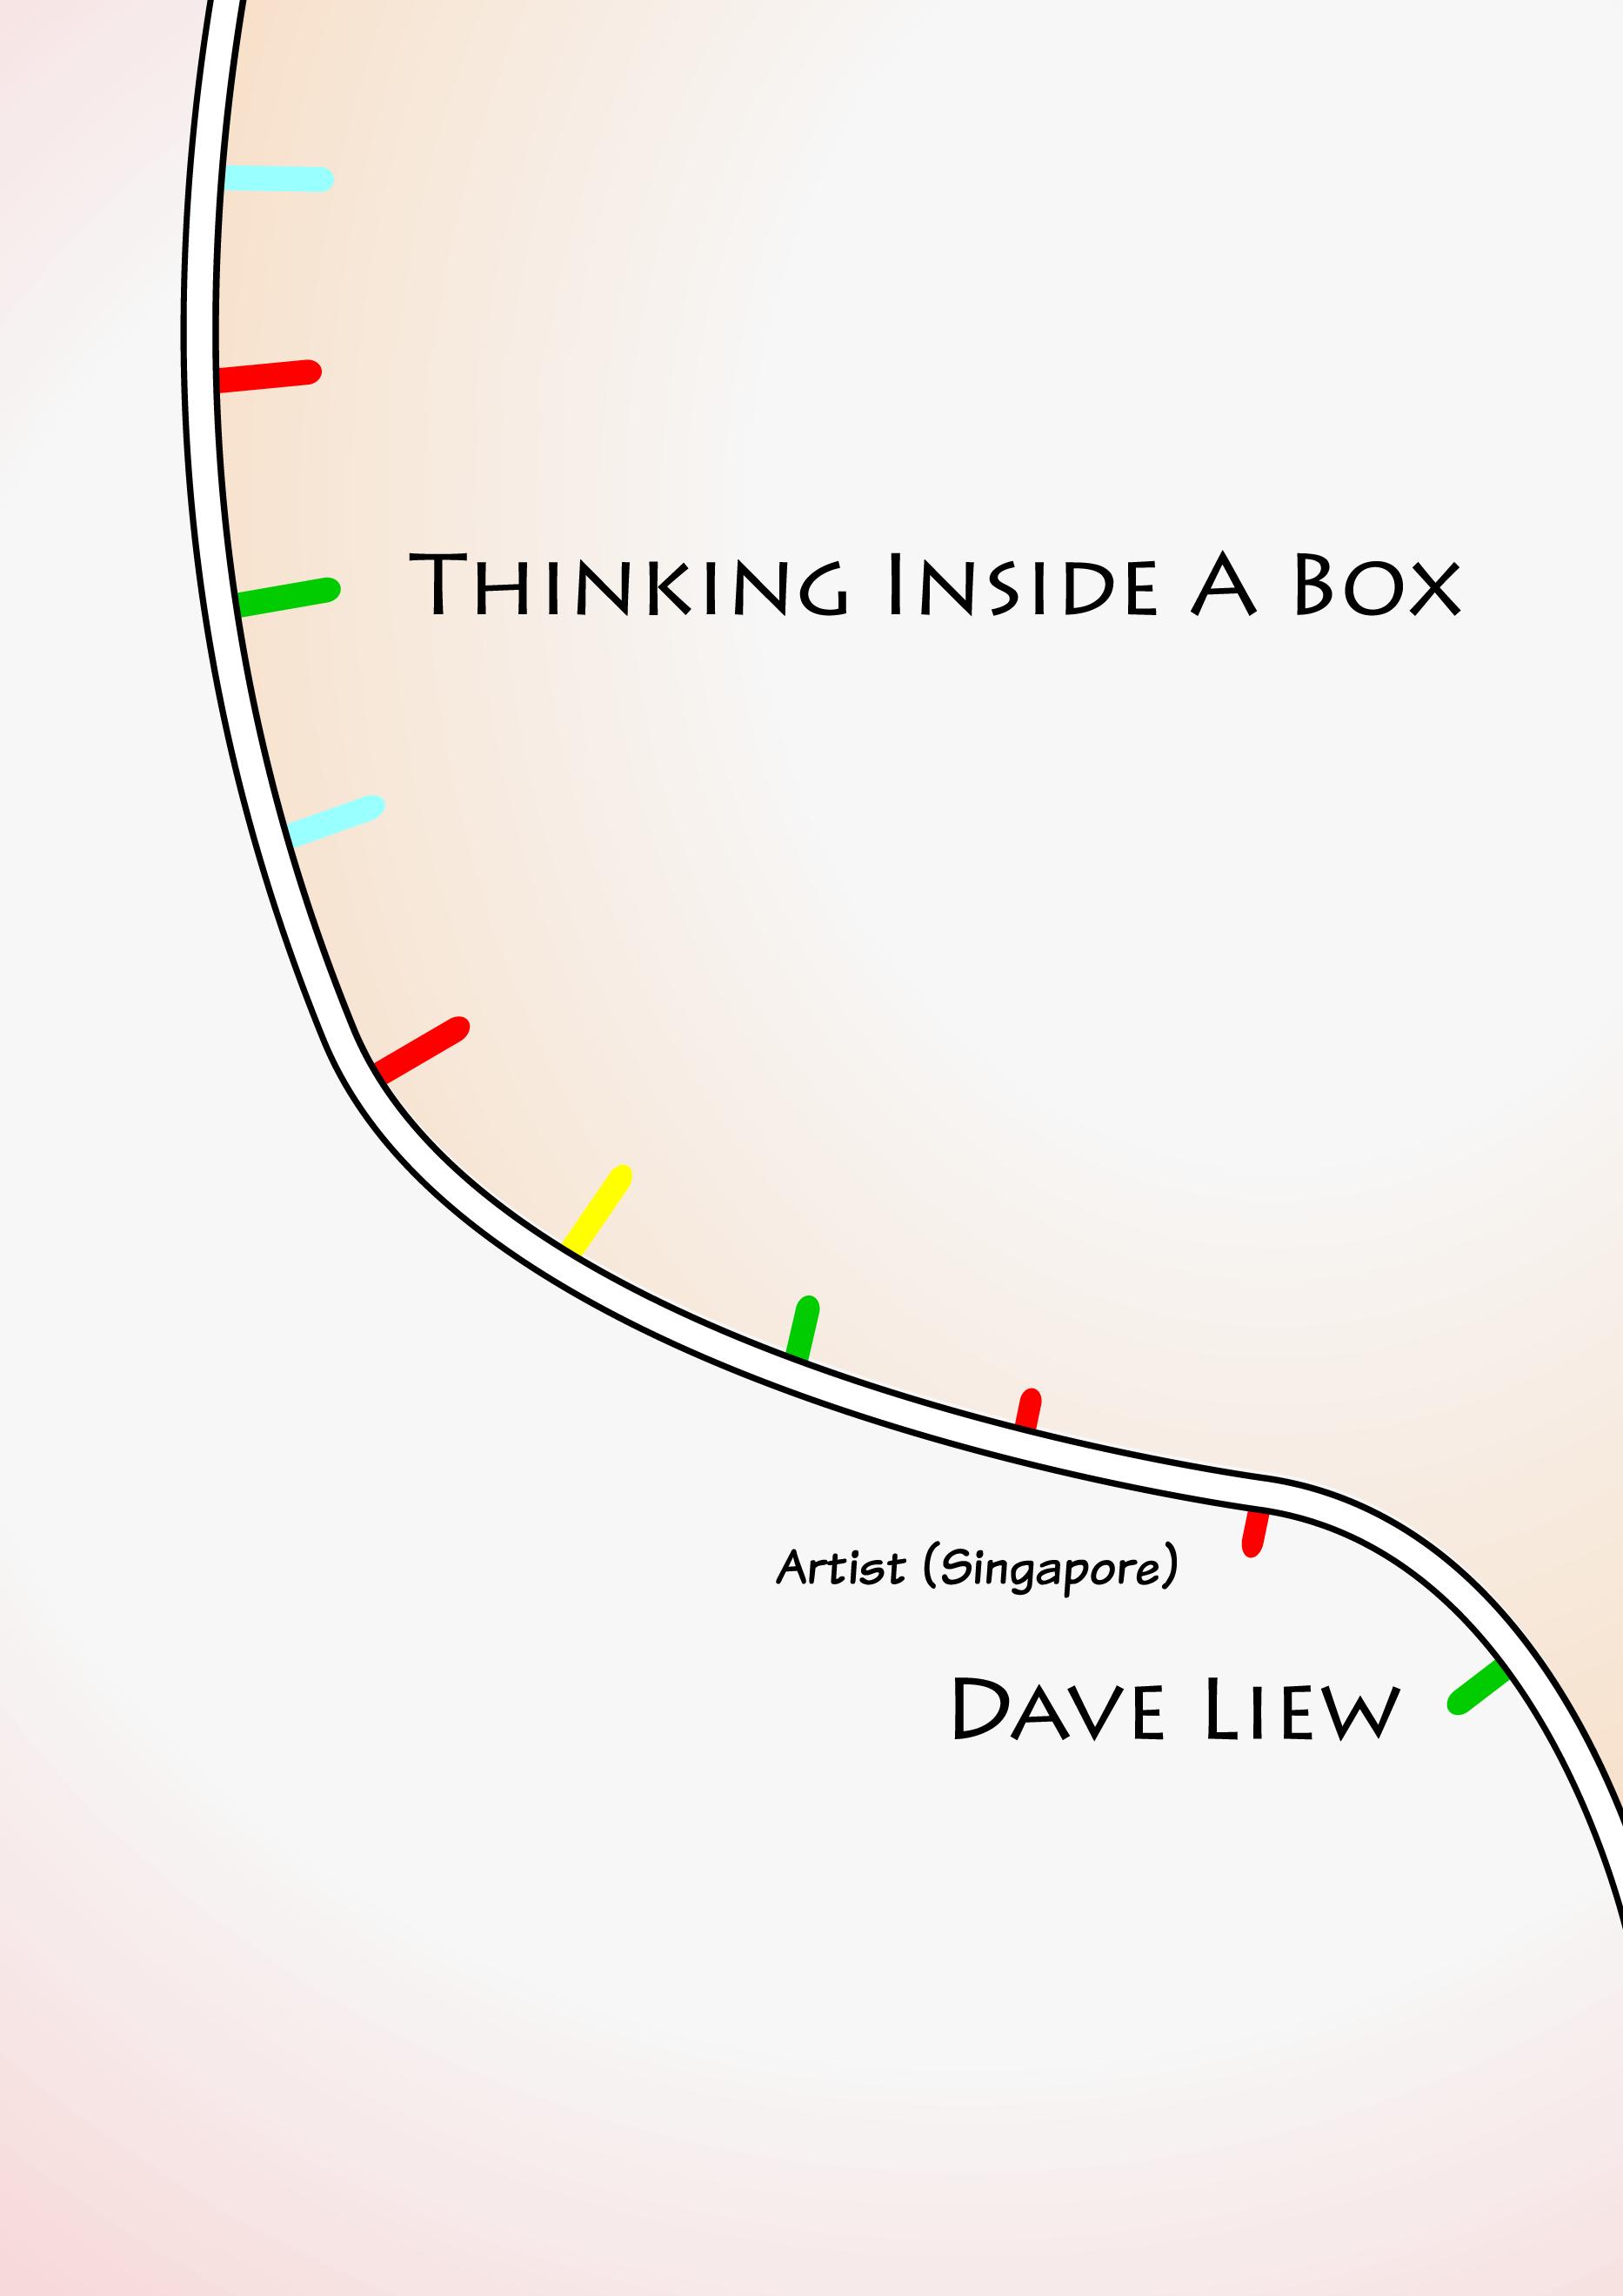 Dave Liew (Singapore)